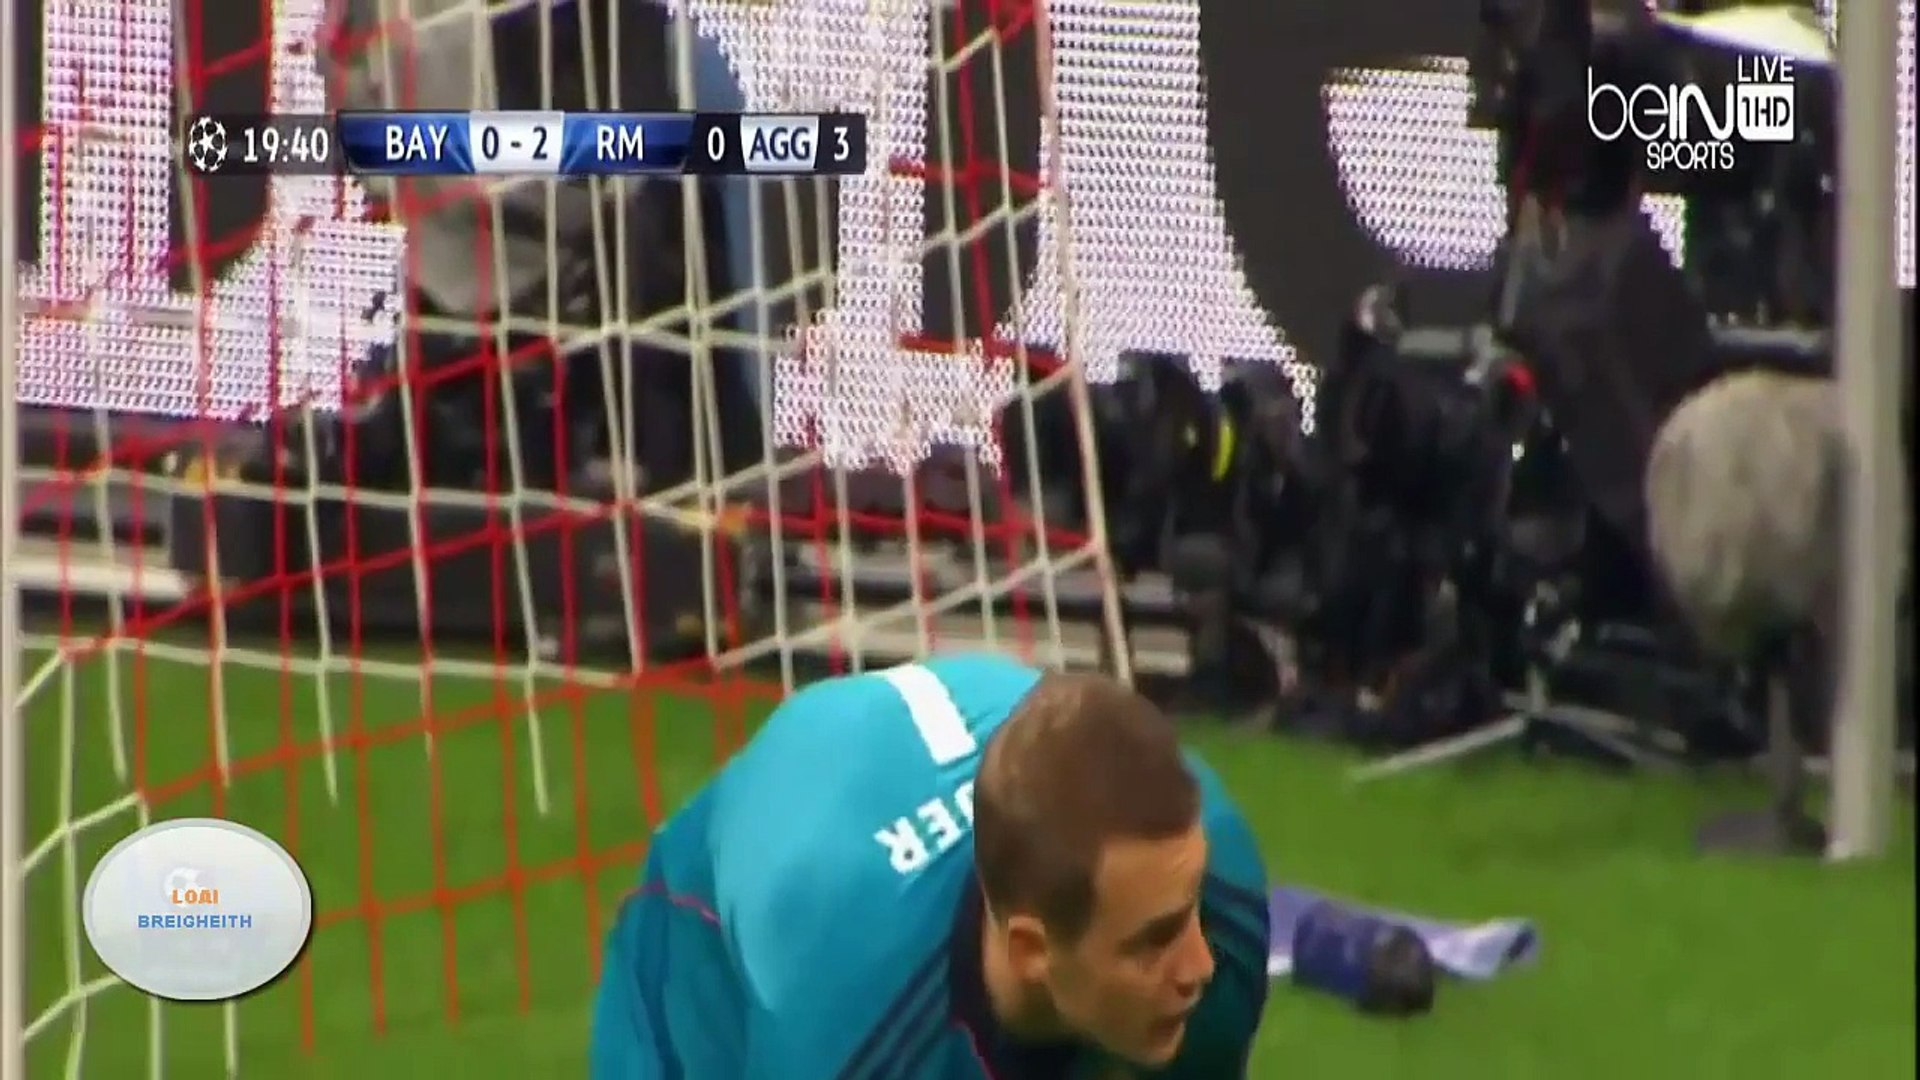 Bayern Munich 0-4 Real Madrid (29-04-2014) Champions Leauge all goals بايرن ميونخ 0-4 ري